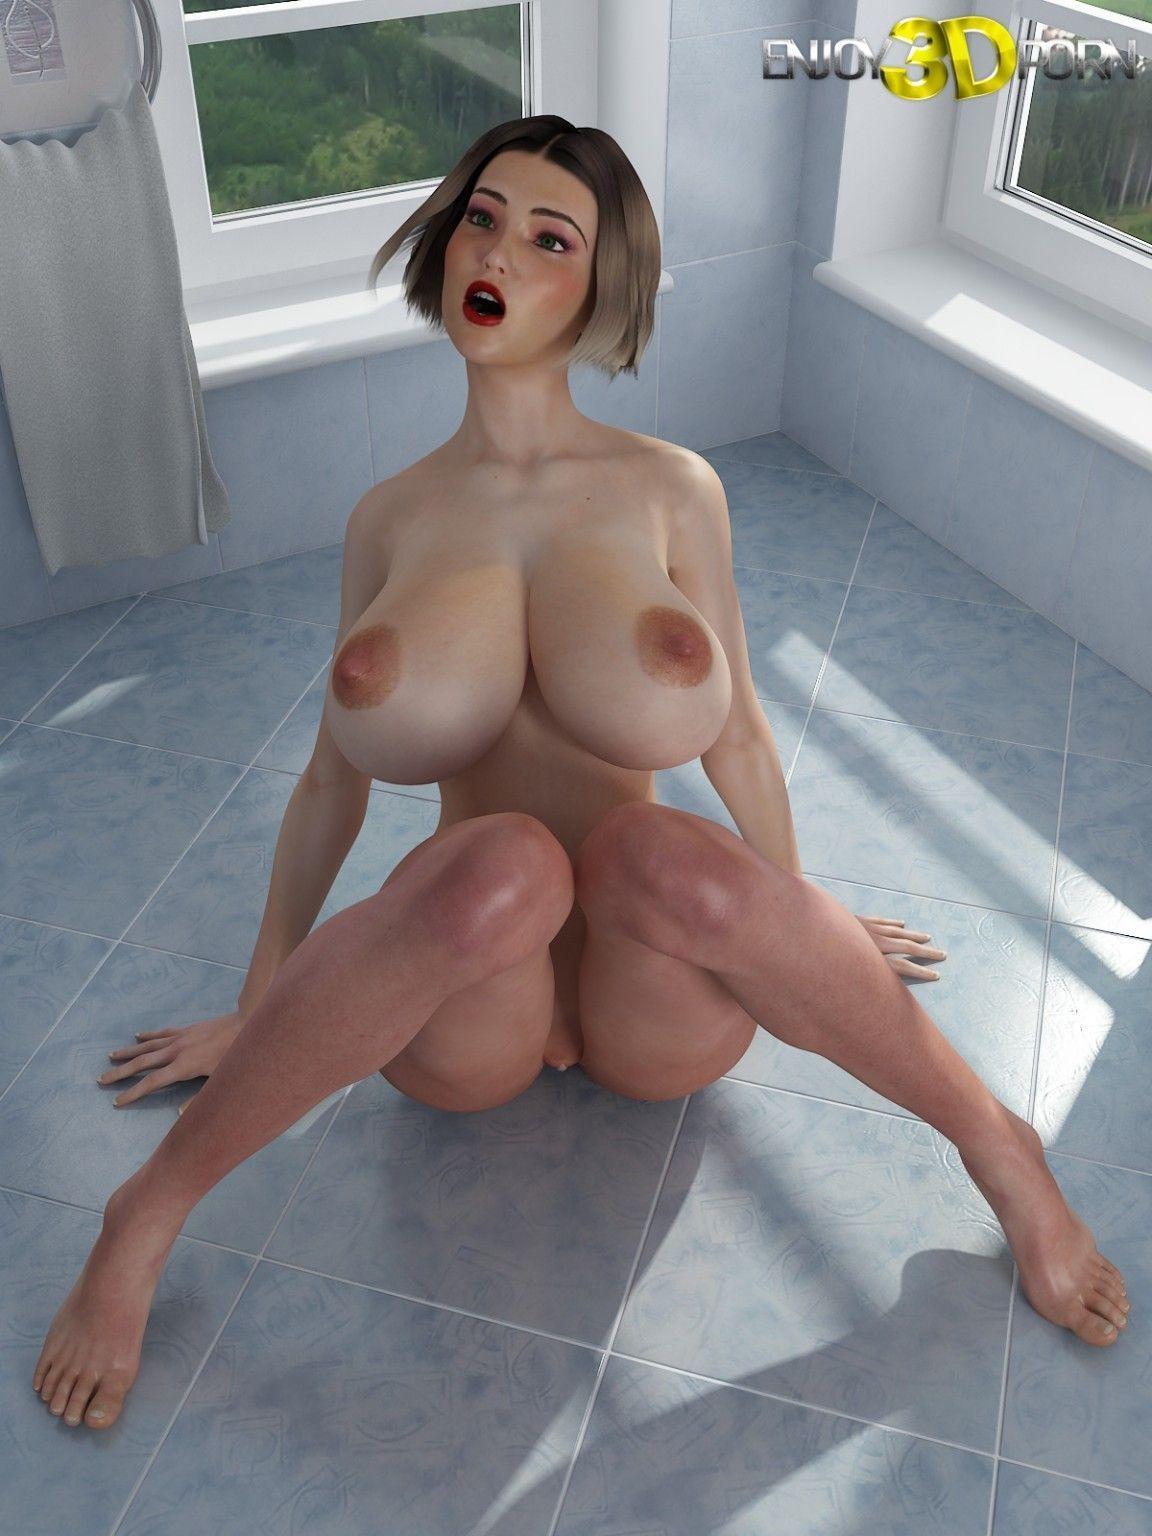 Gigantic perfect tits